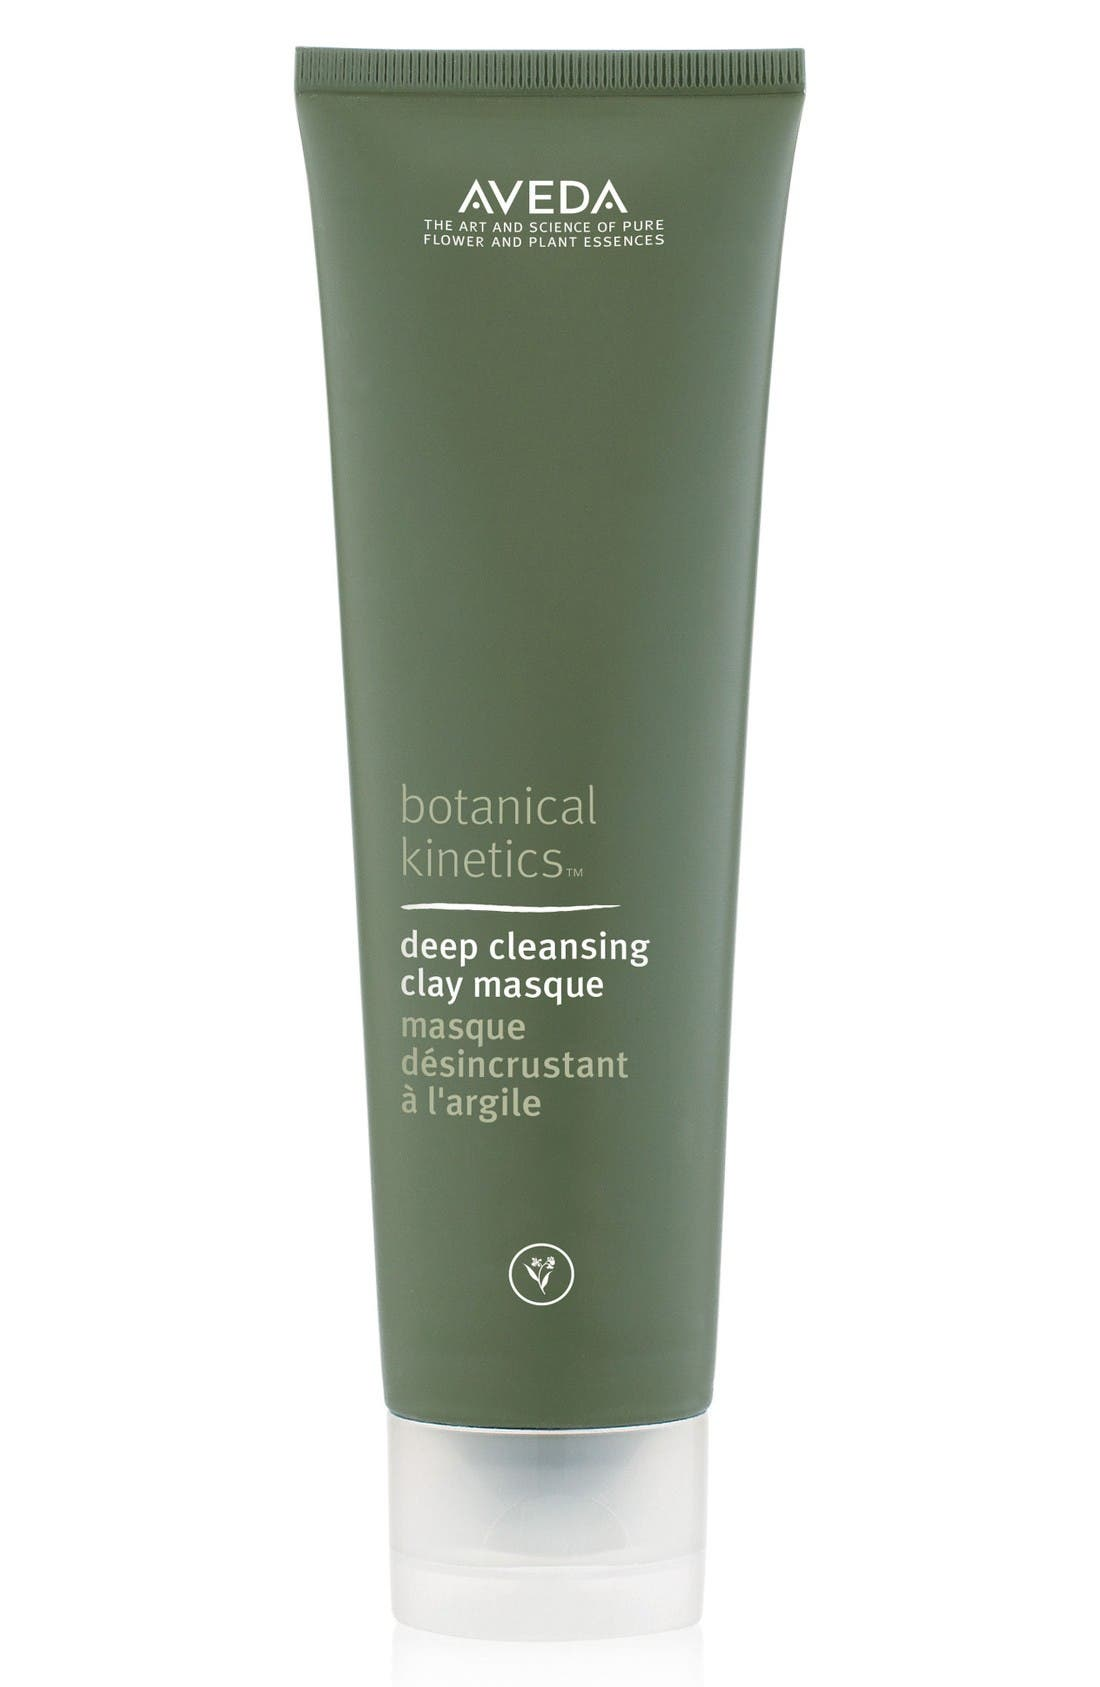 Aveda botanical kinetics™ Deep Cleansing Clay Masque